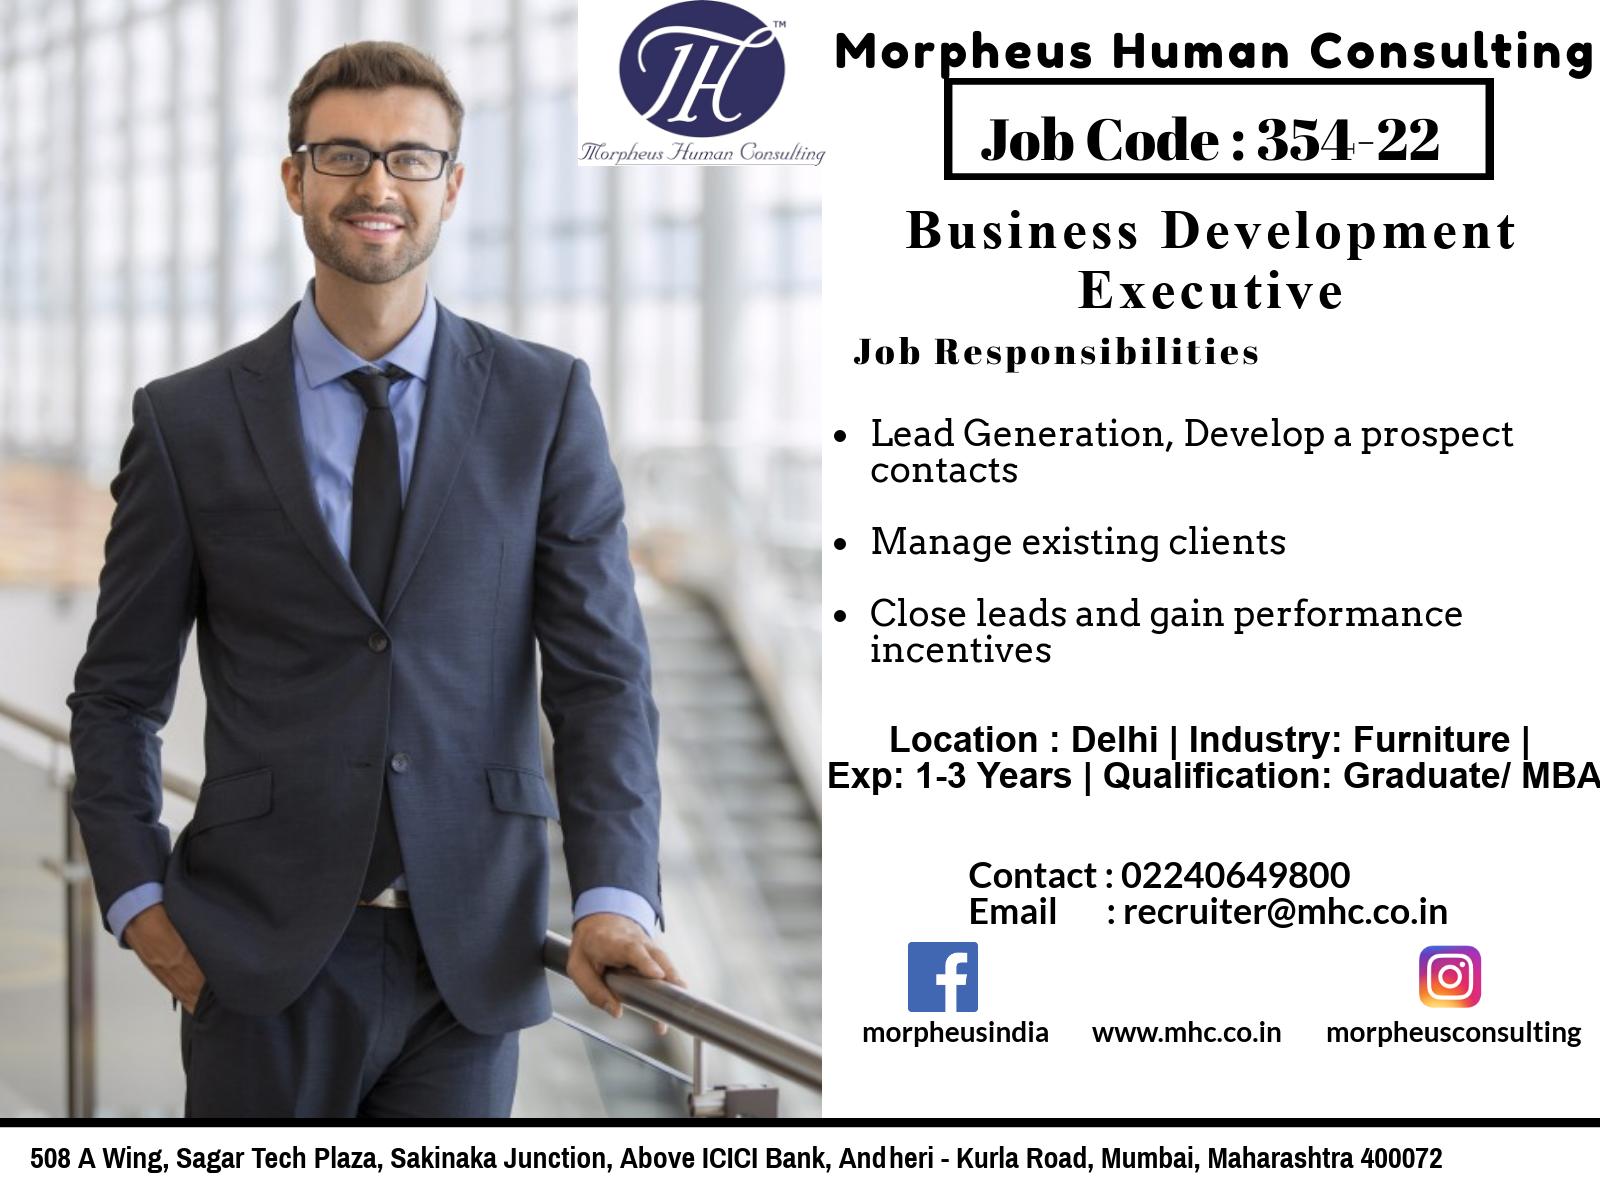 Business Development Manager 351 22 Morpheus Consulting Executive Jobs Business Development Job Opening